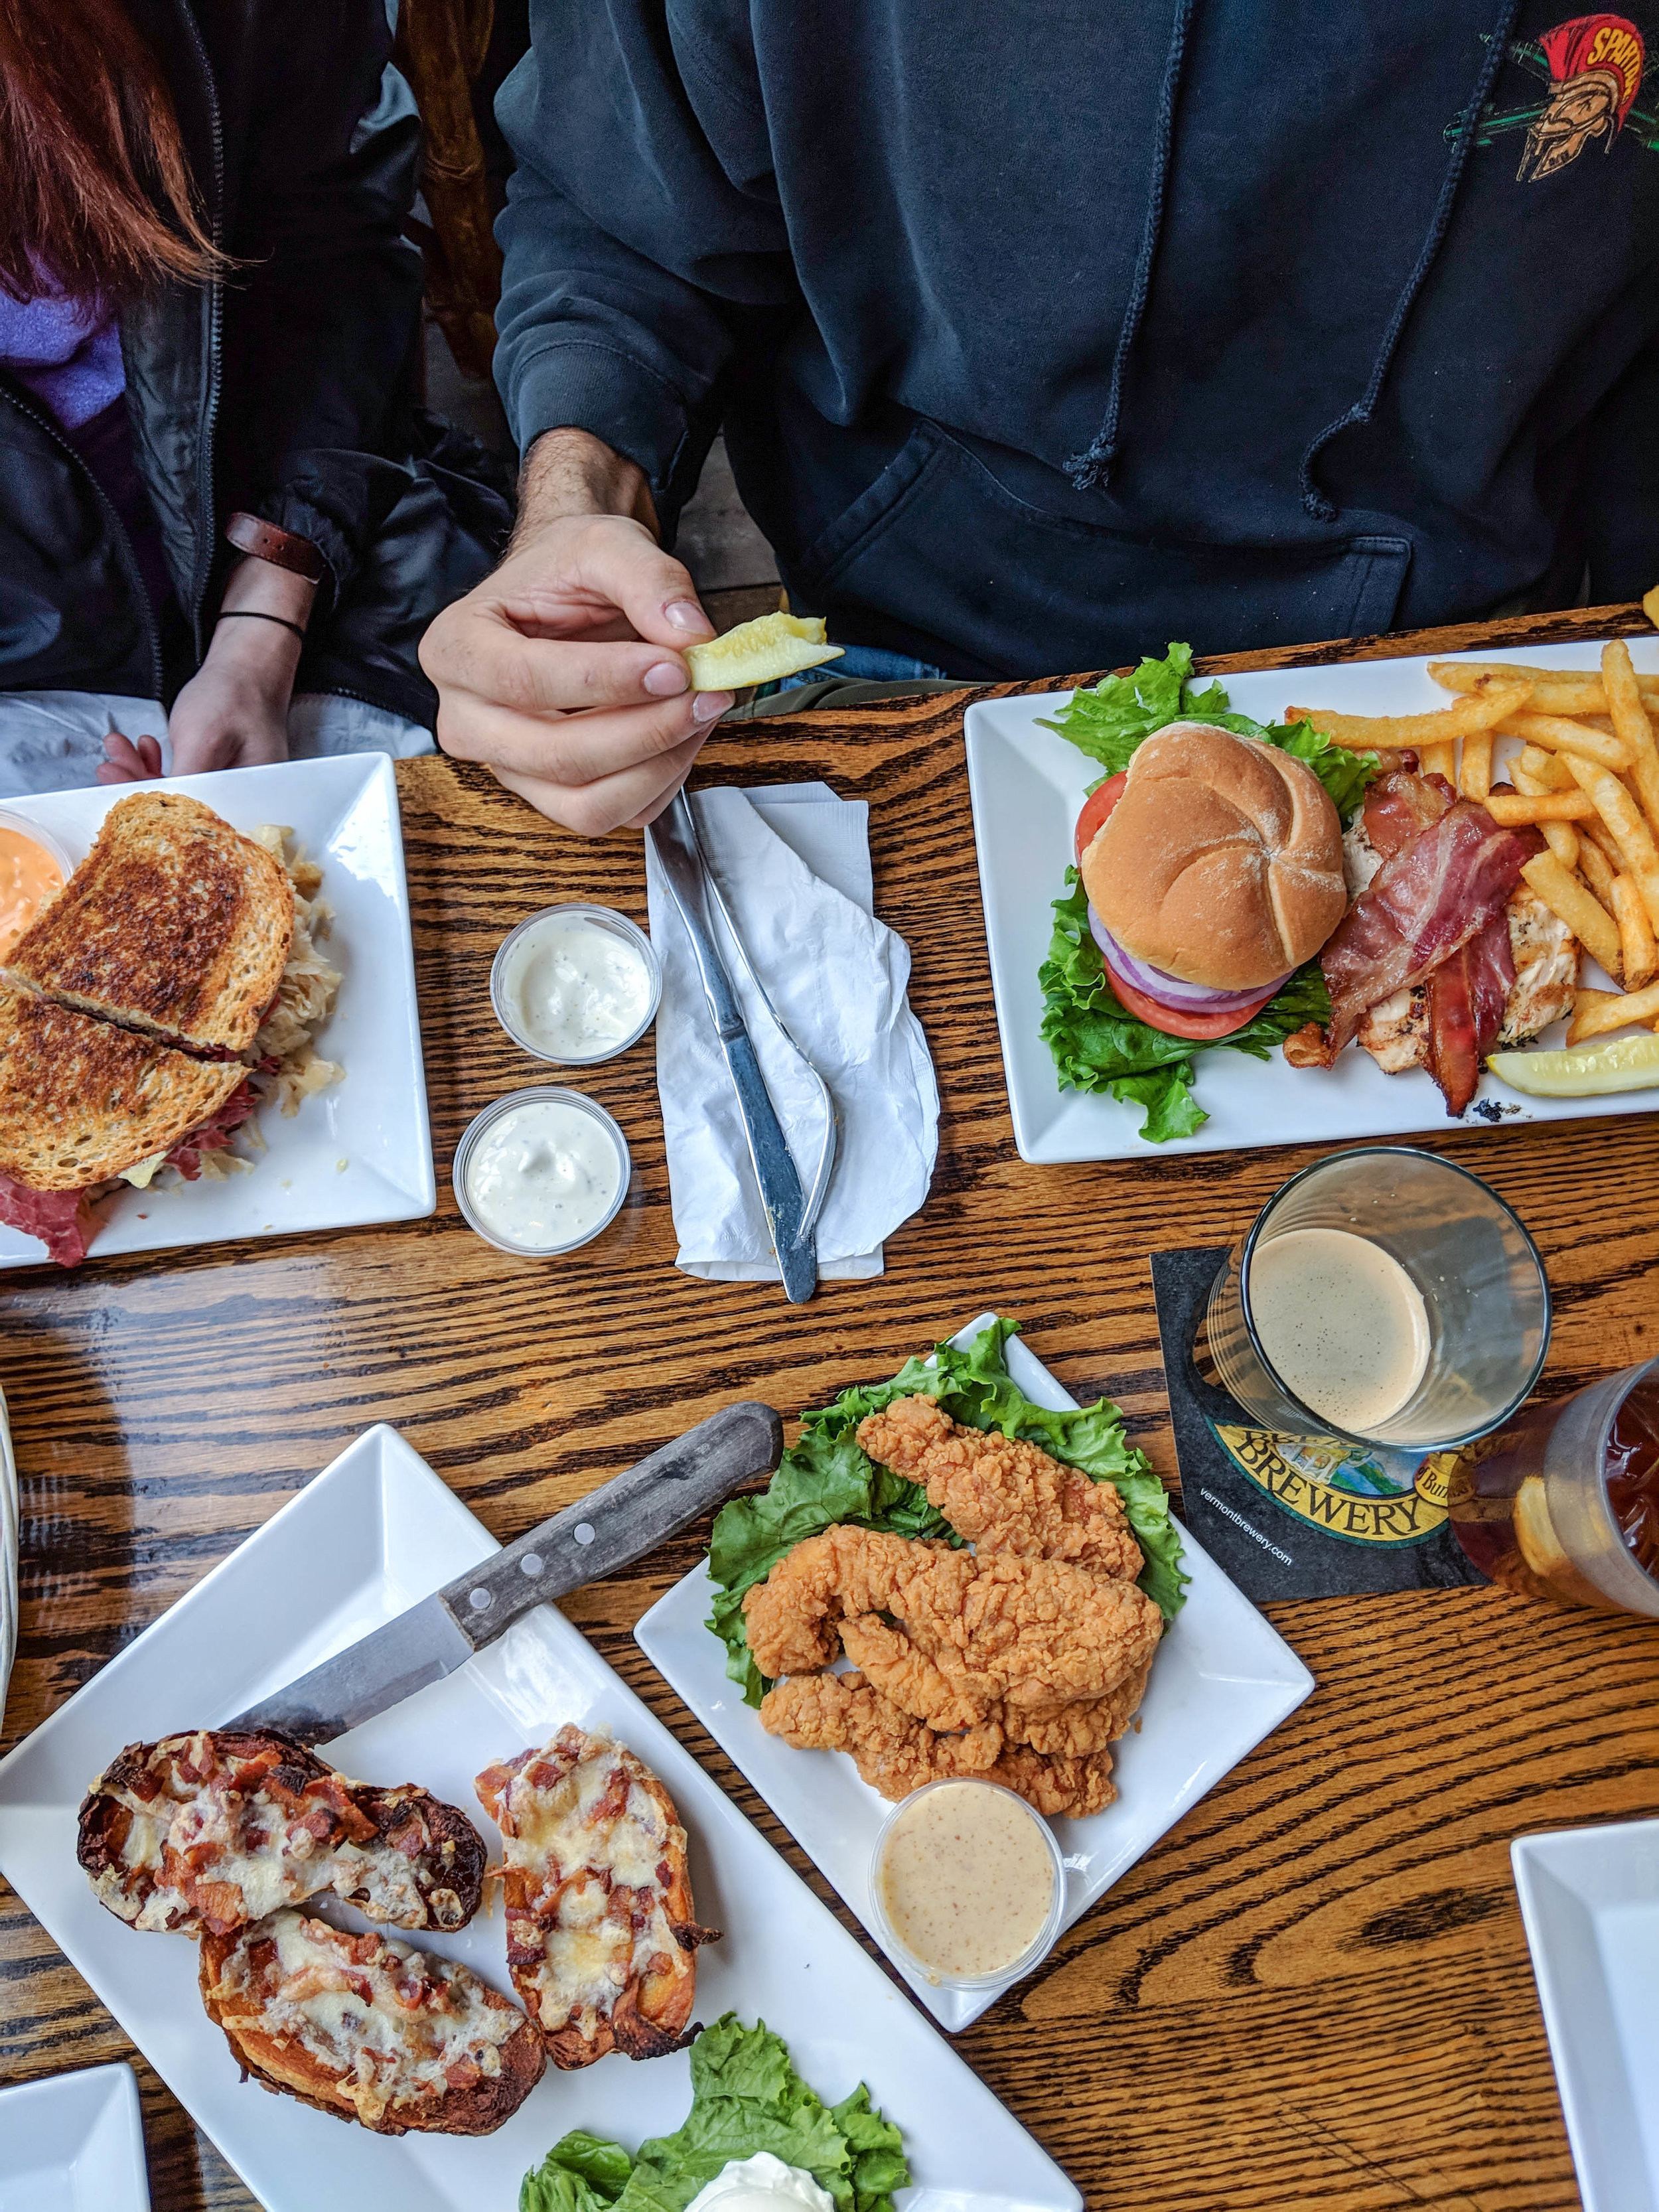 bri rinehart; photography; food; vermont pub & brewery